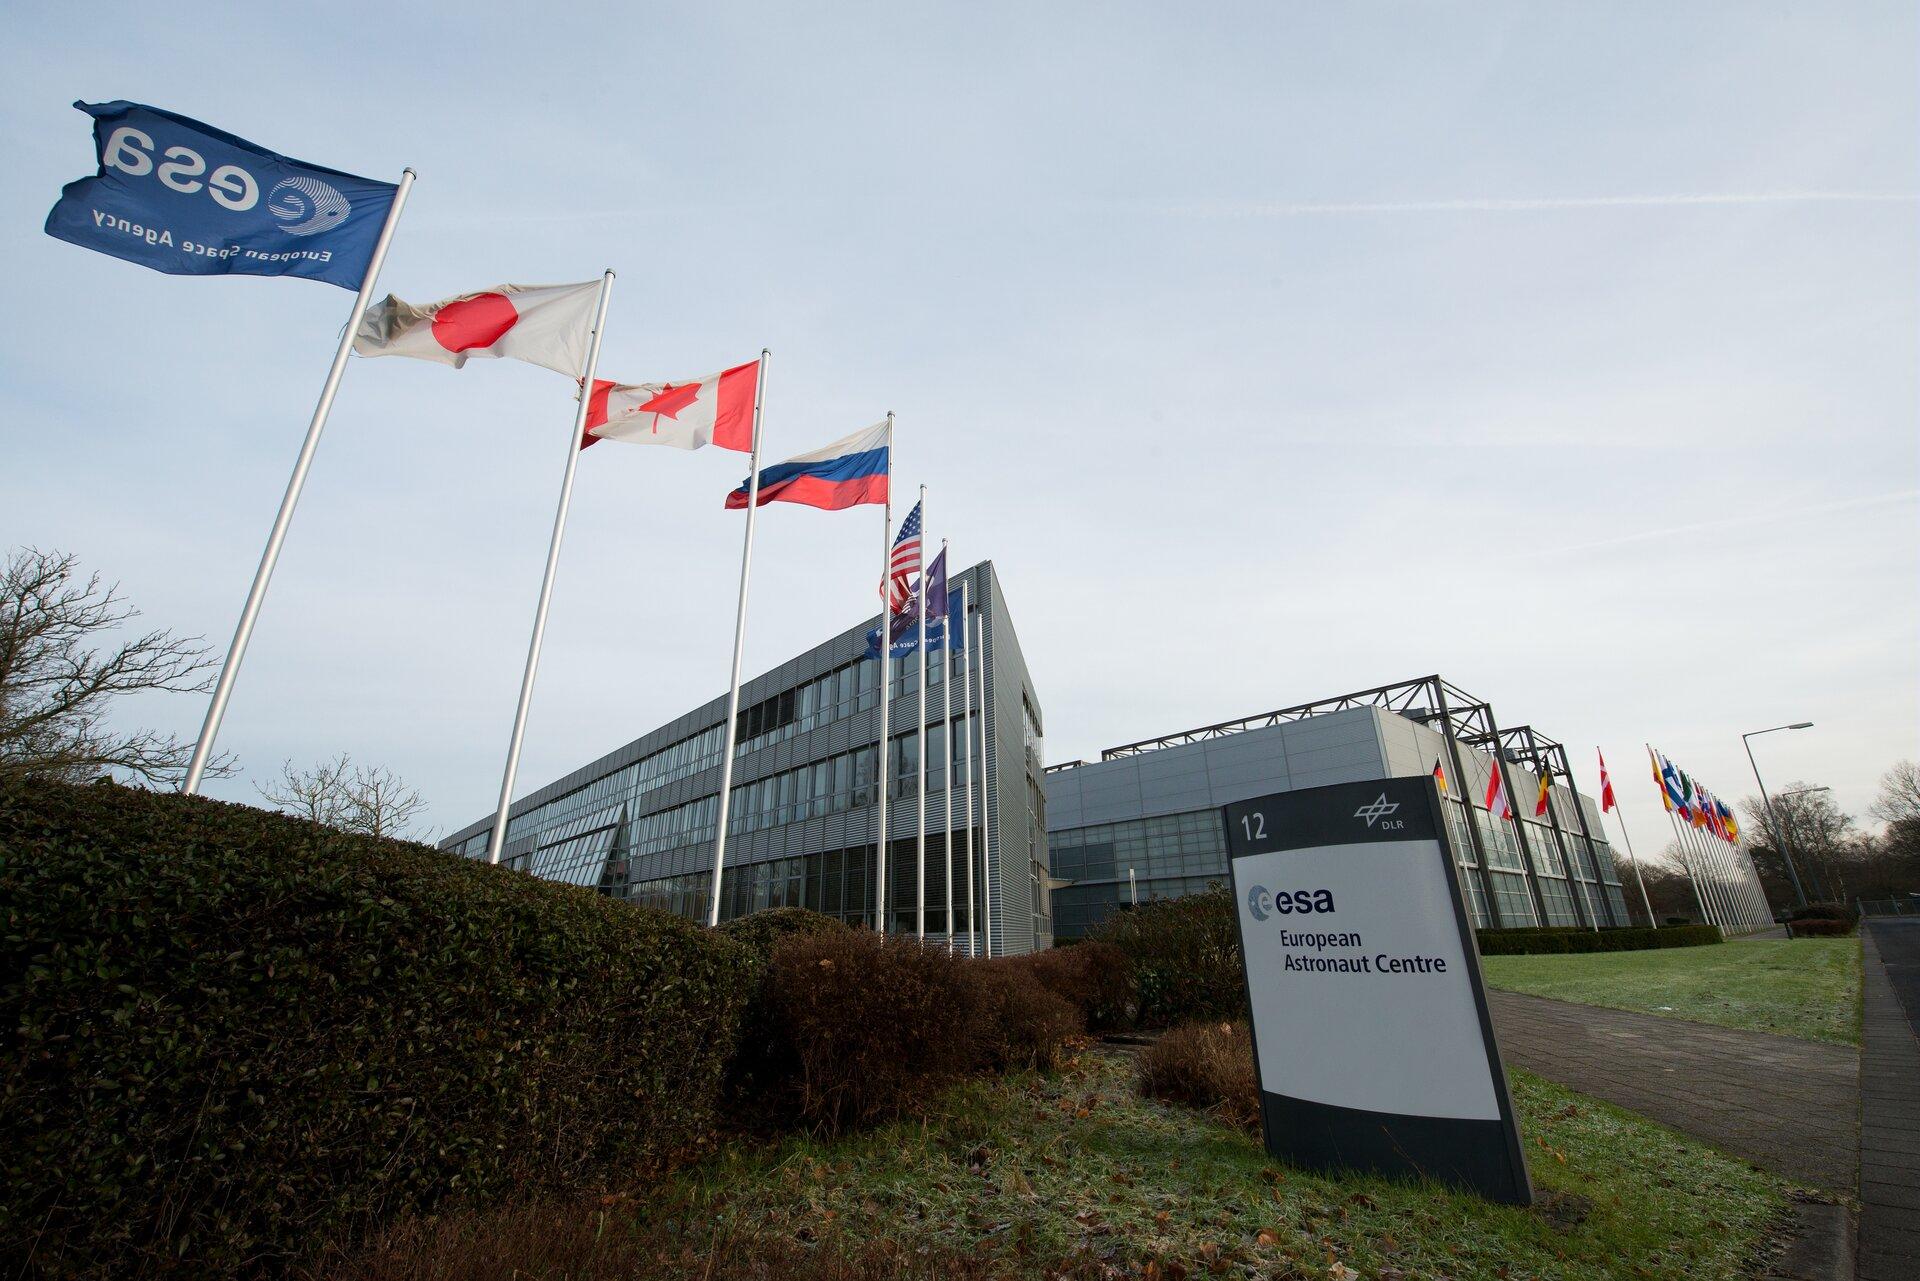 The European Astronaut Centre